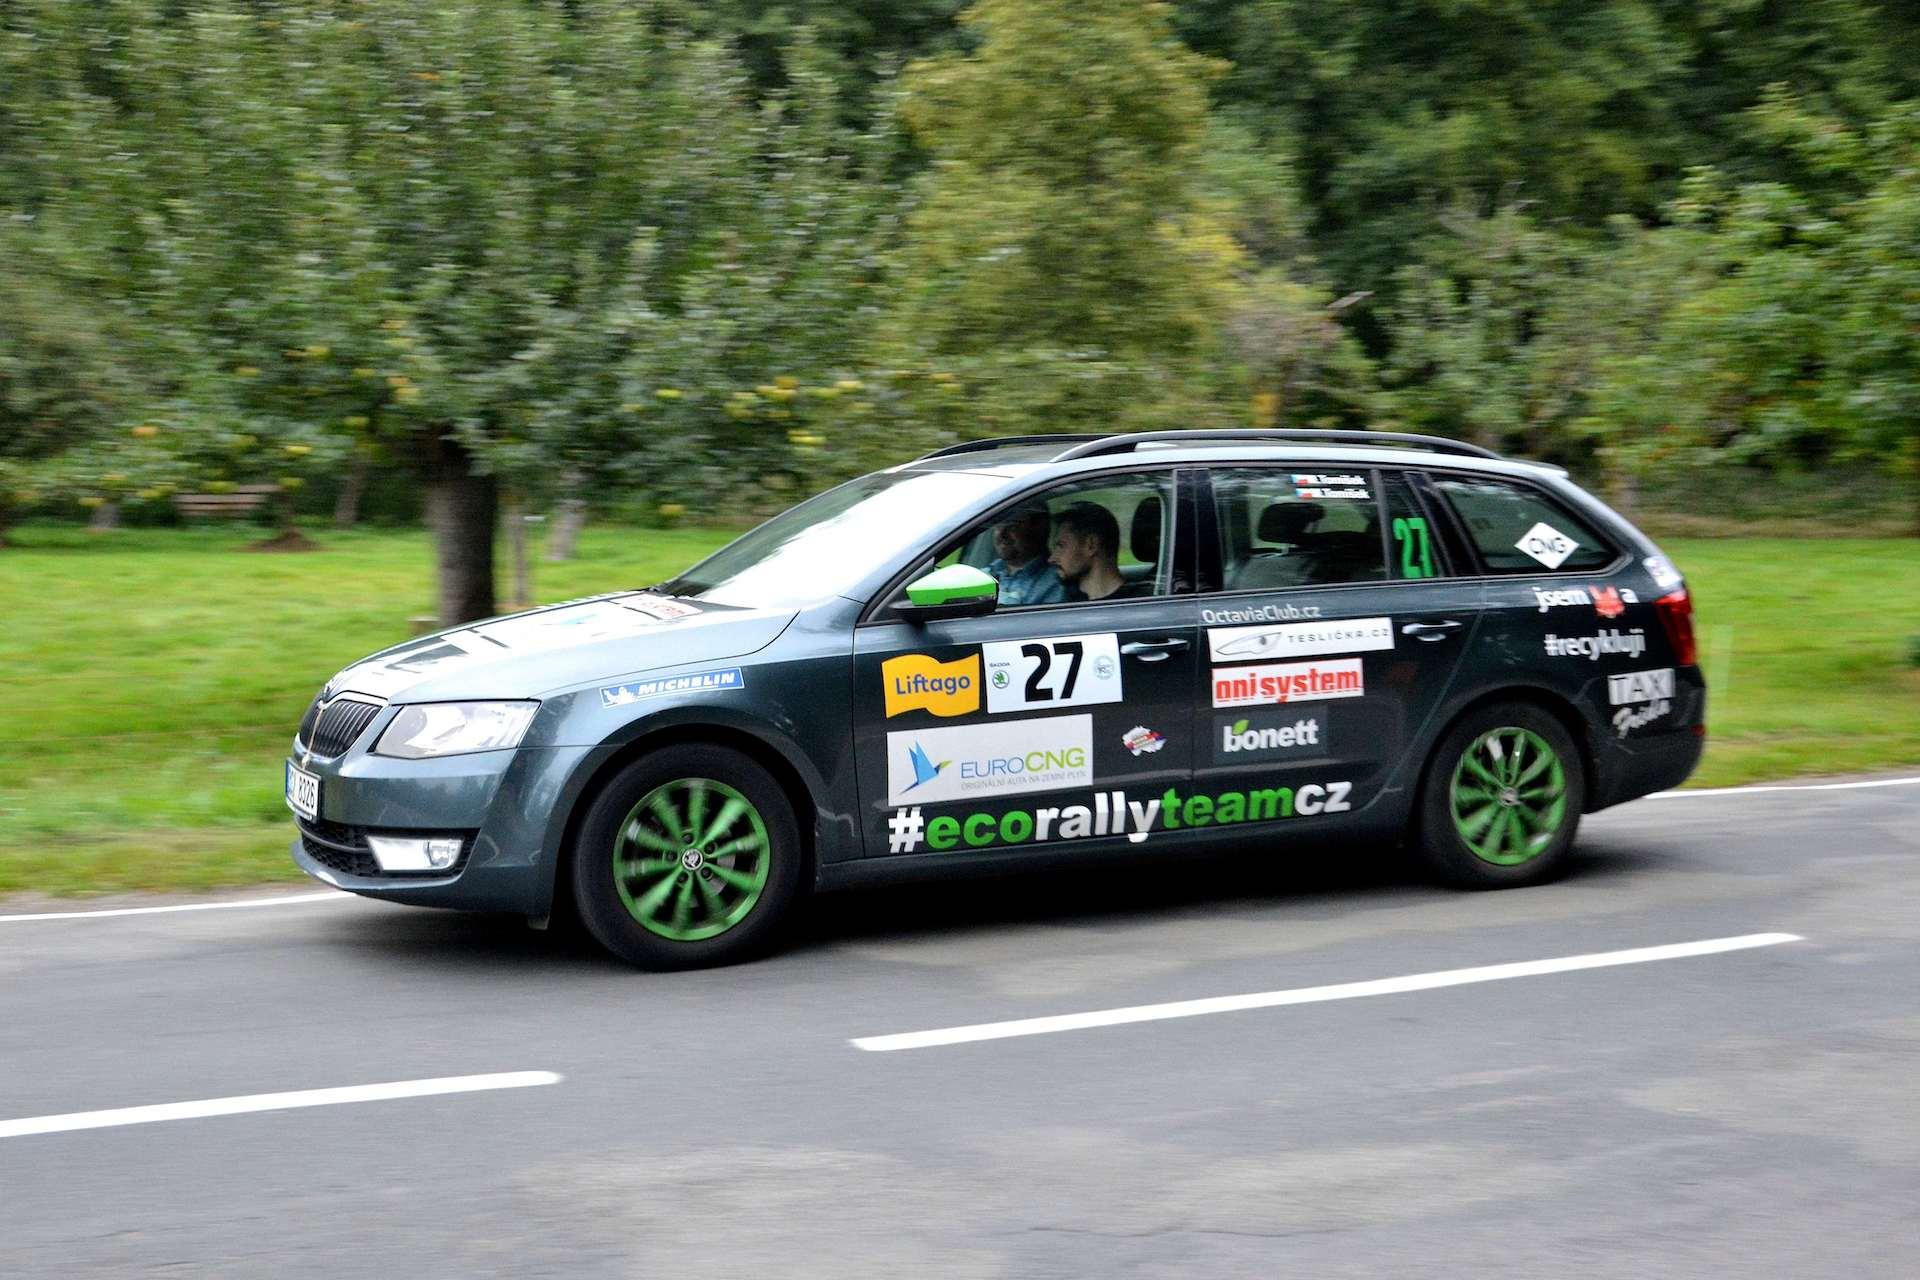 Škoda Octavia Combi G-TEC #EcoRallyTeamCZ